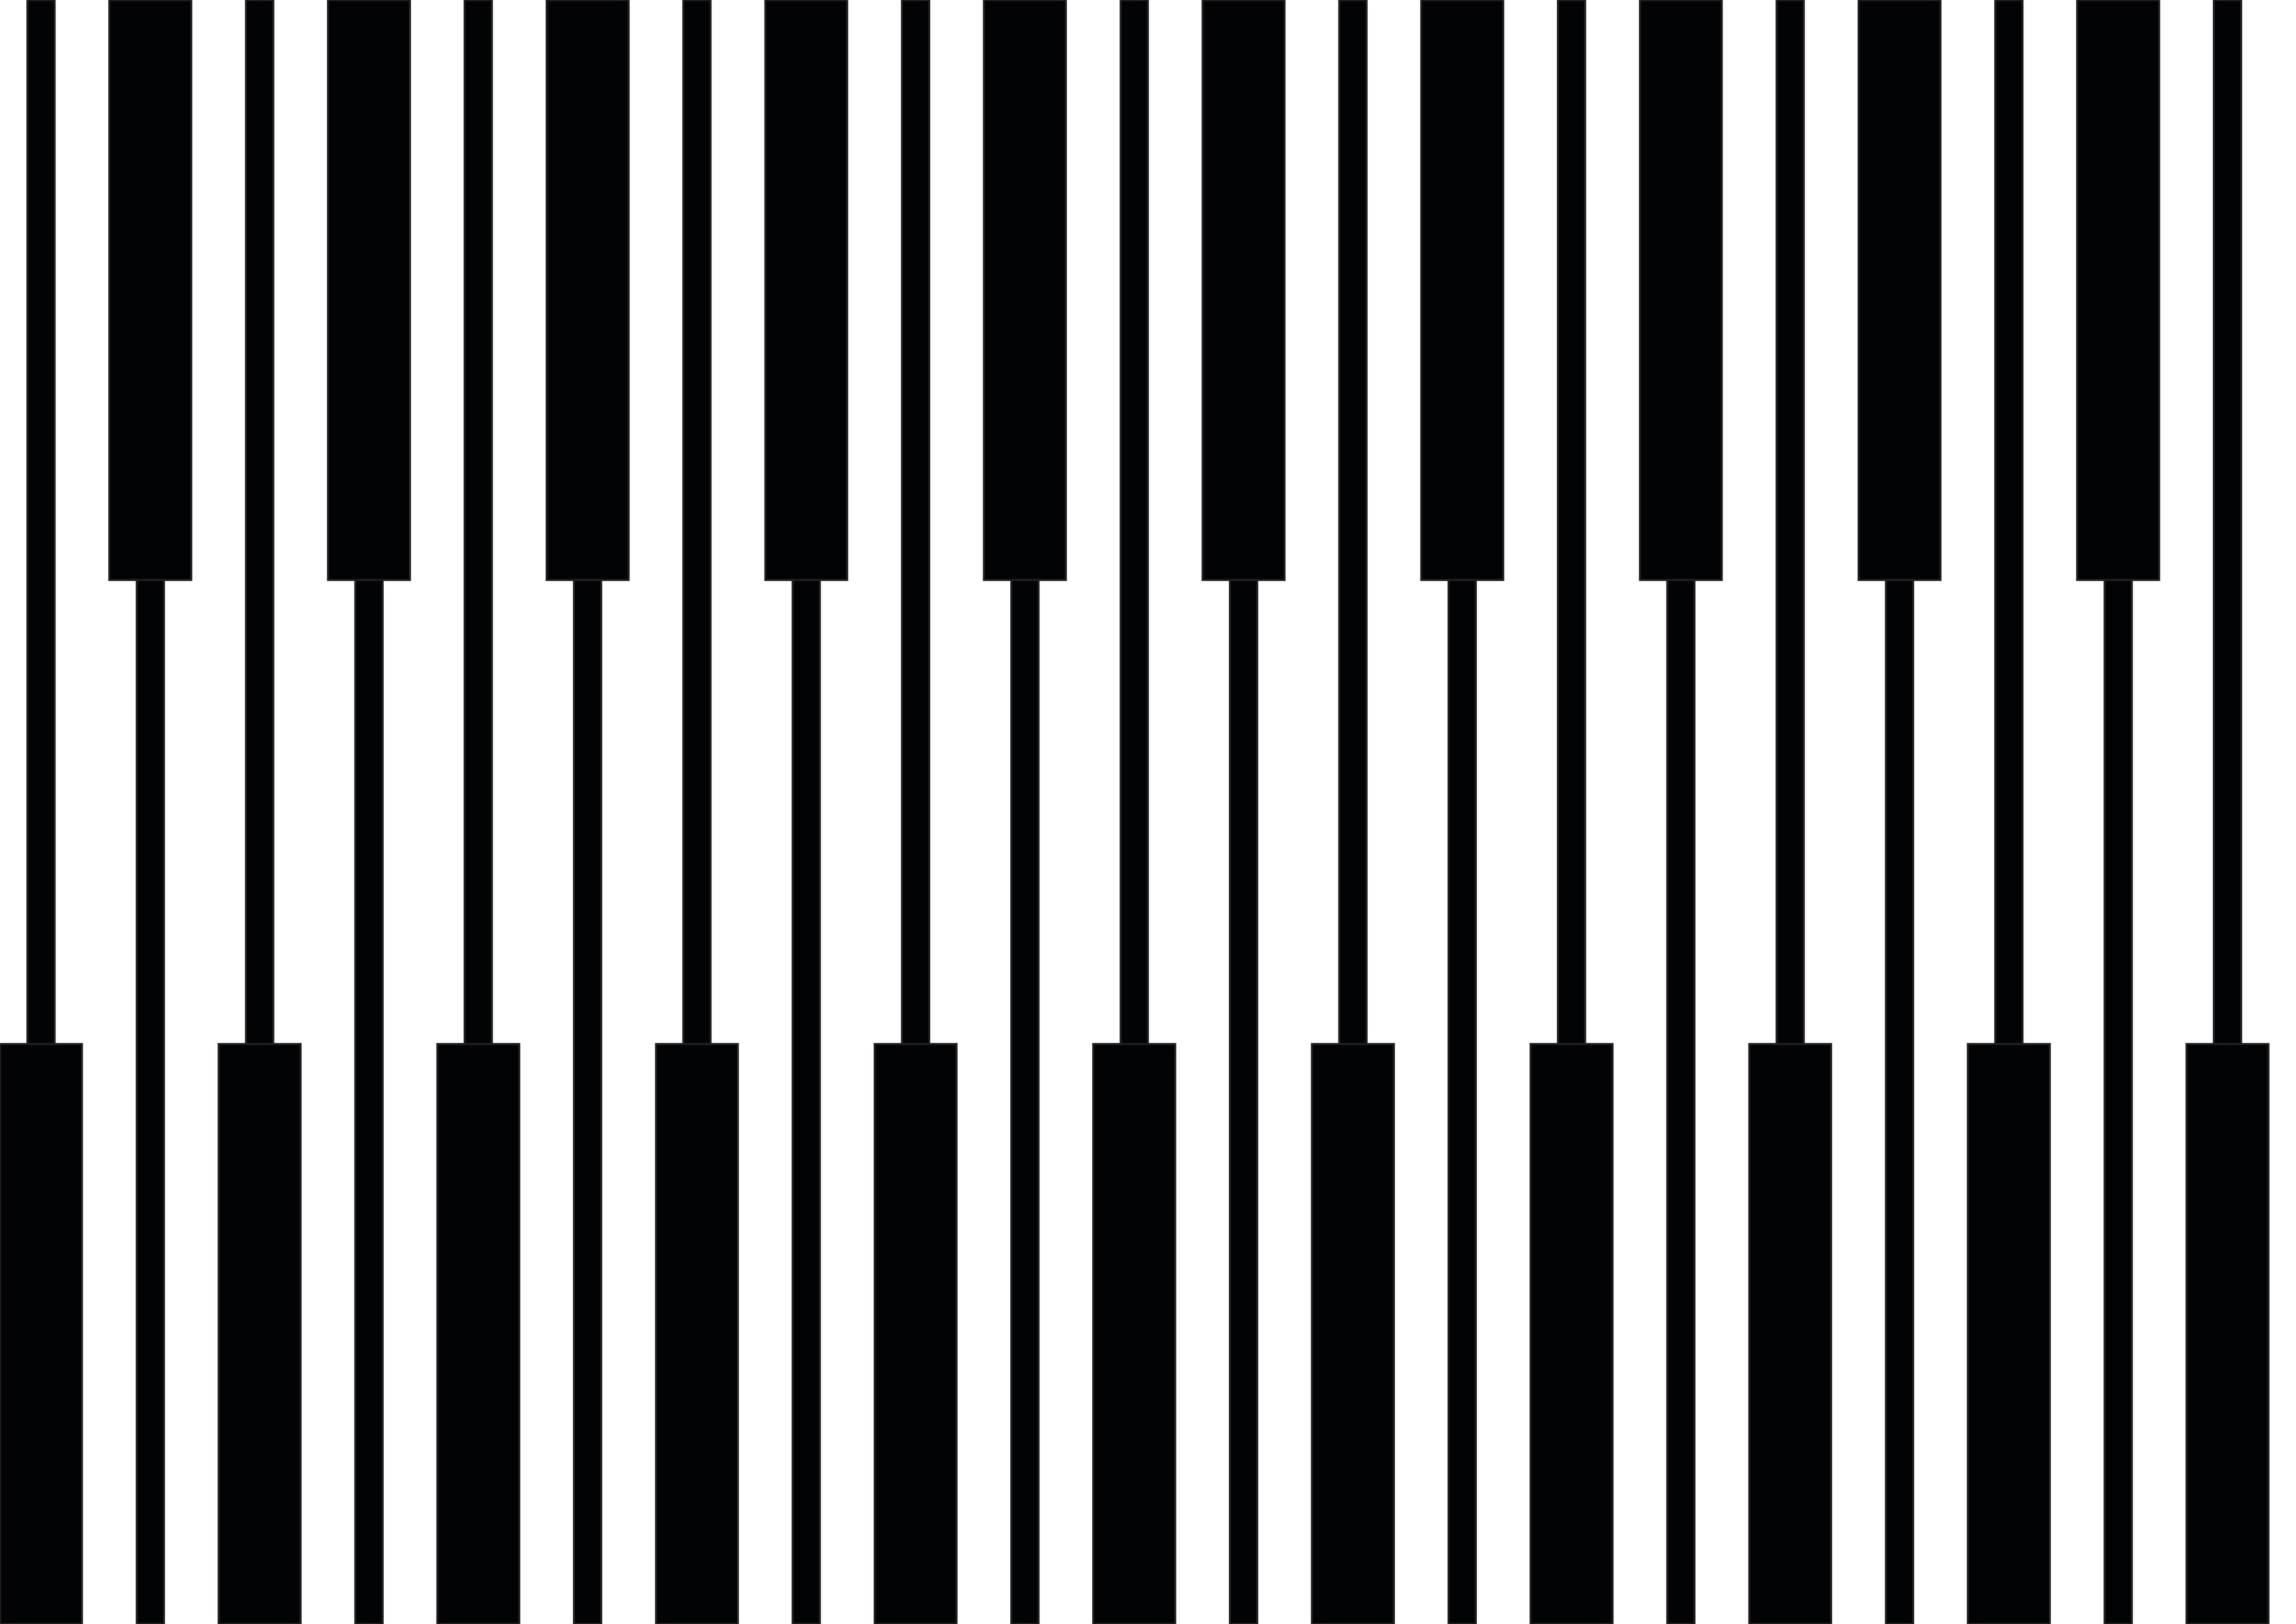 Stripe 22-01